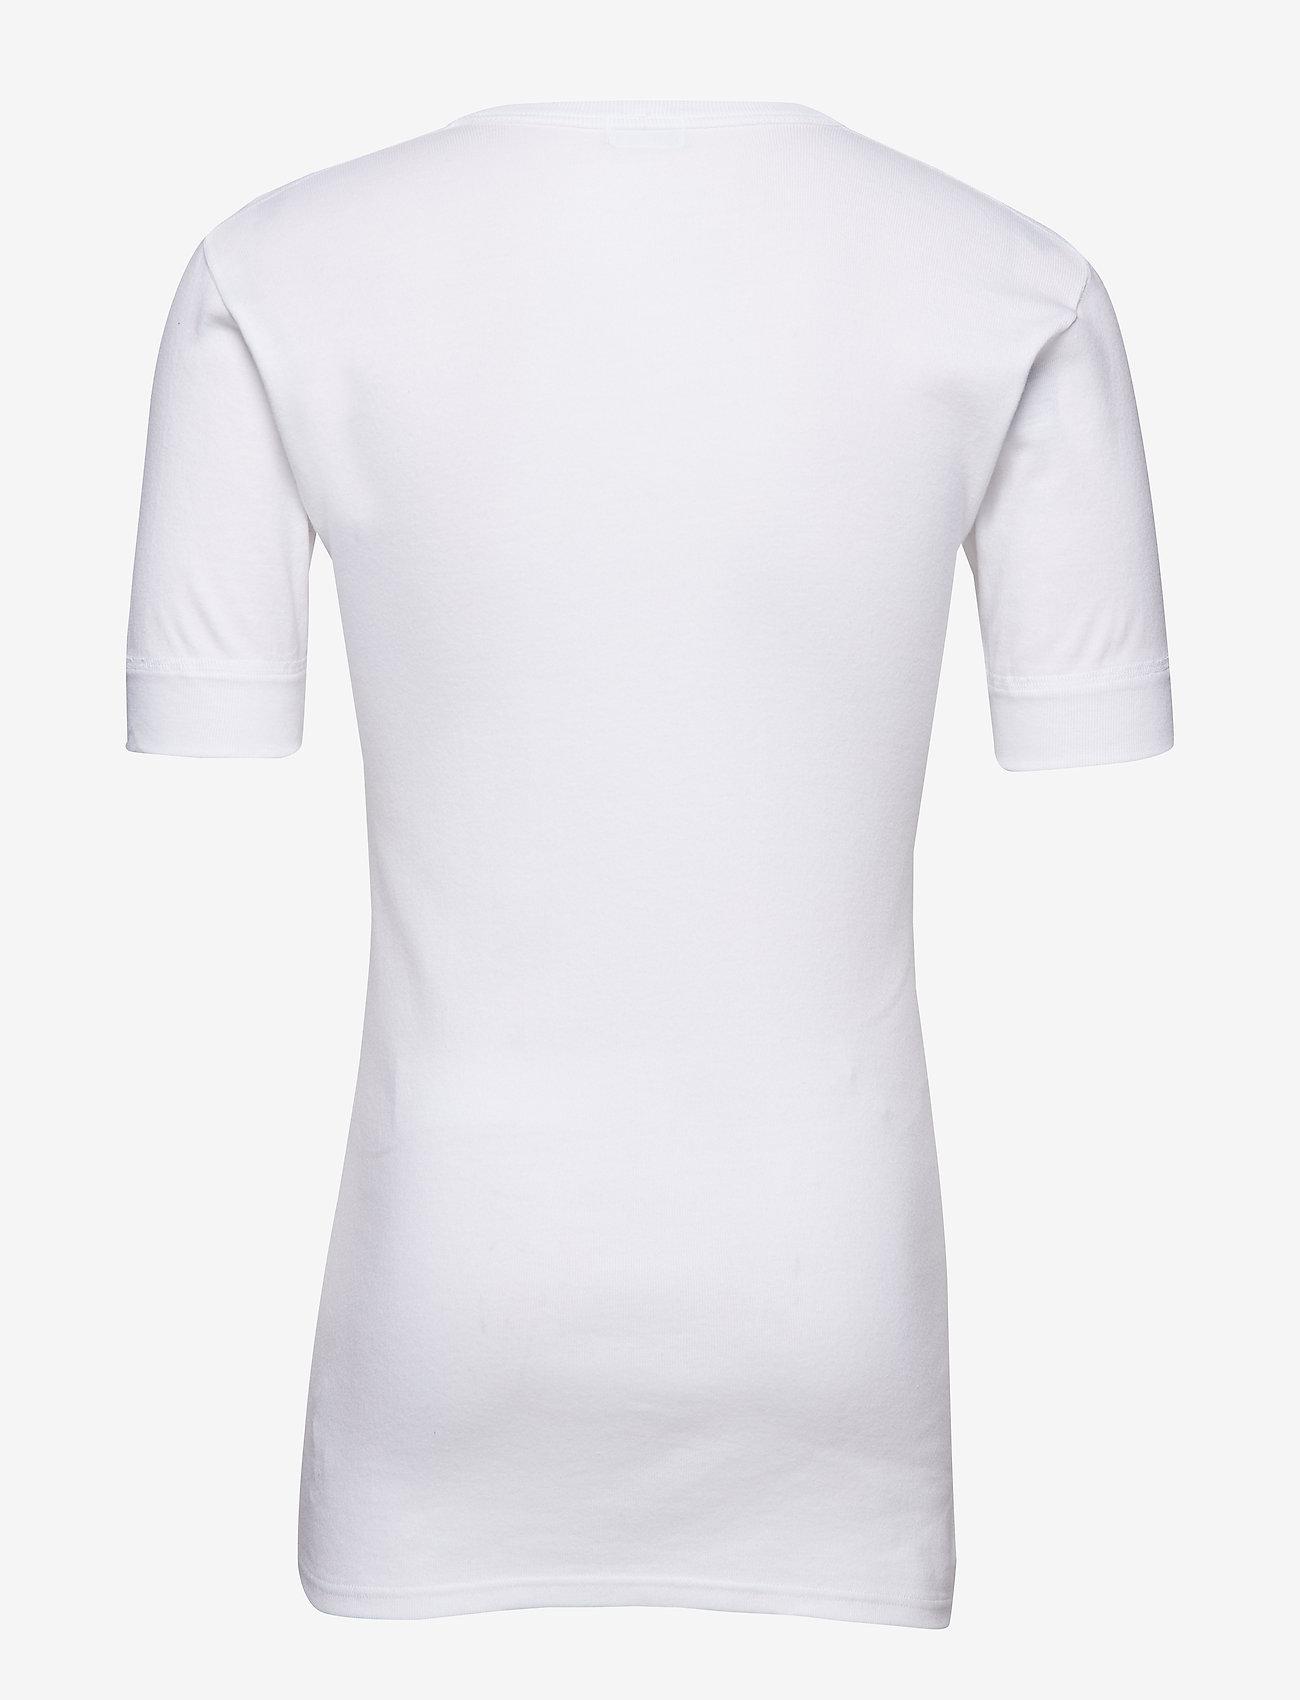 JBS - Original tee - basic t-shirts - white